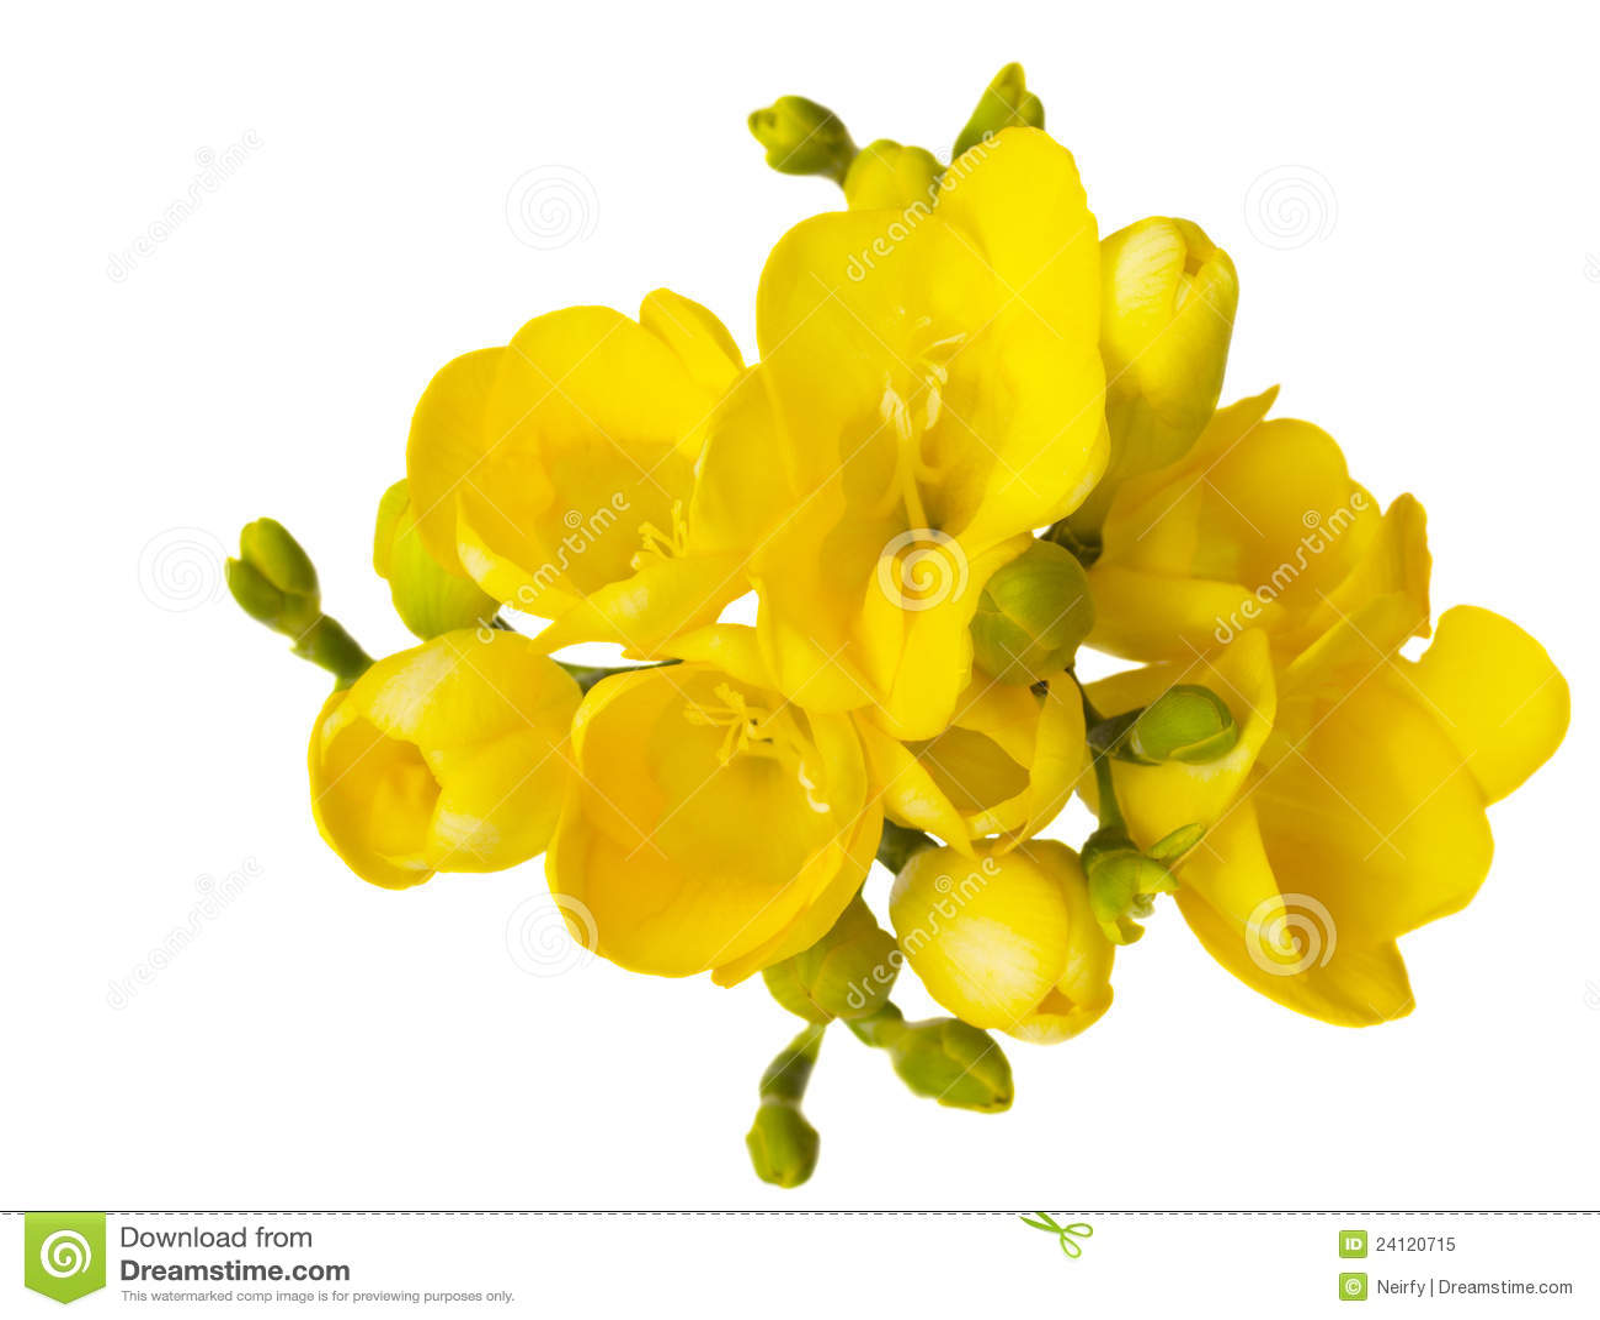 Yellow Freesia Flowers Stock Image Image Of Delicate 24120715